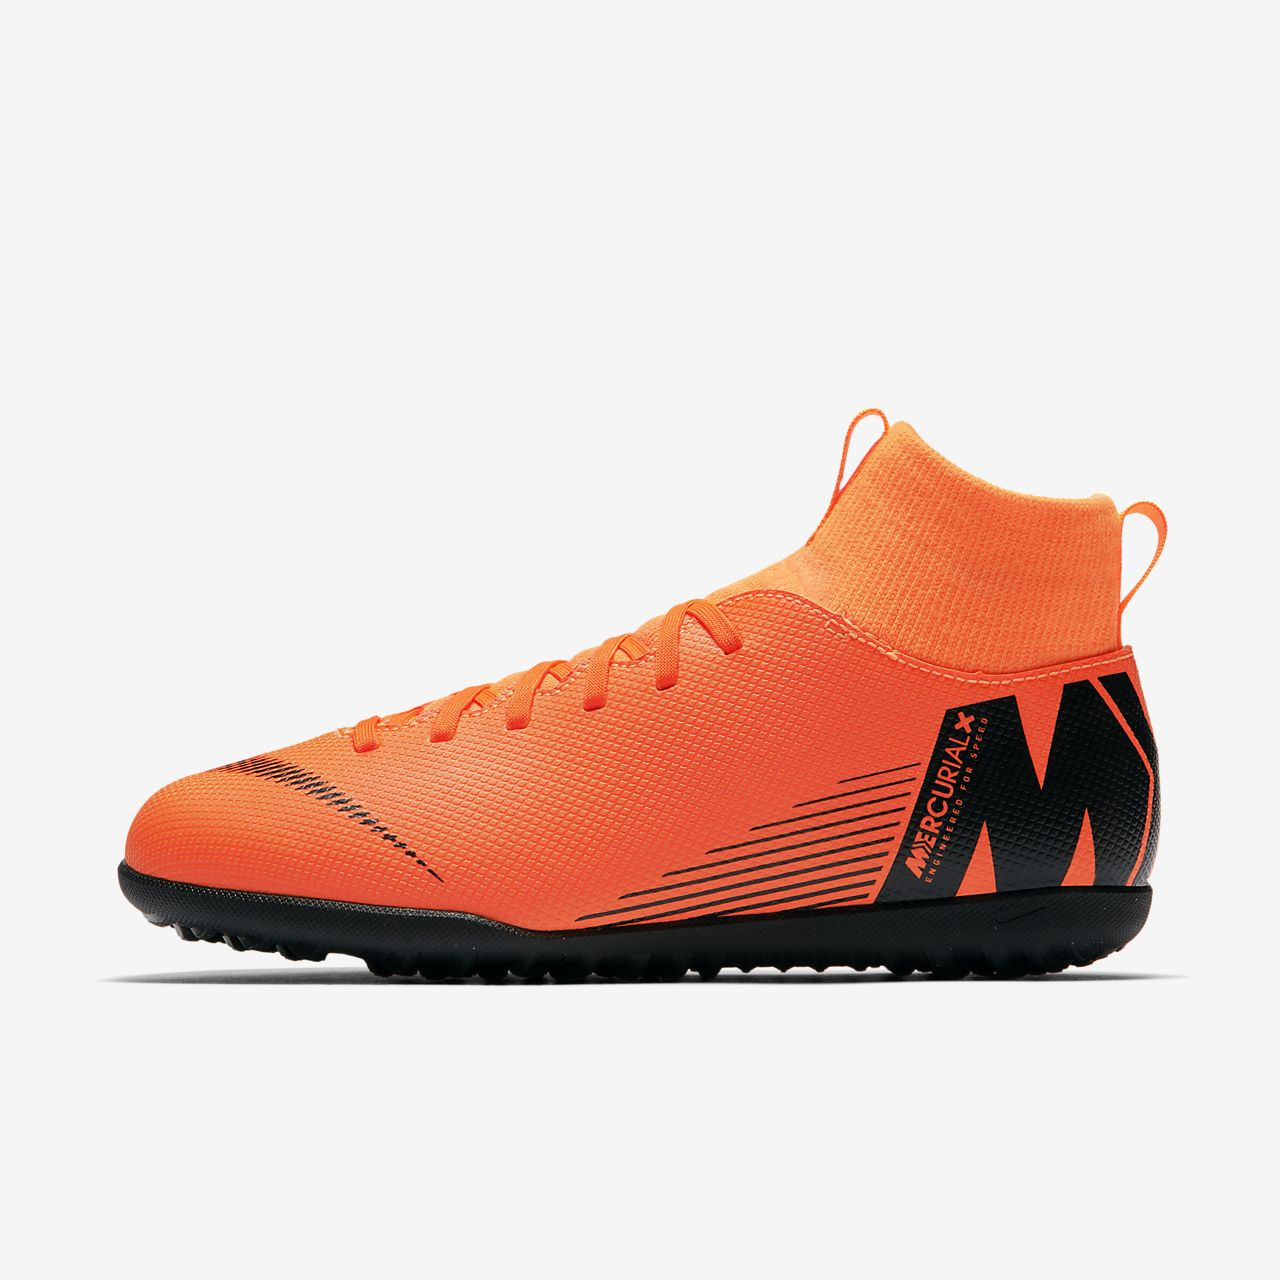 sale retailer 8bad4 2ec76 ... svart orange volt nike jr. mercurialx superfly vi club tf fotballsko  for syntetisk underlag til